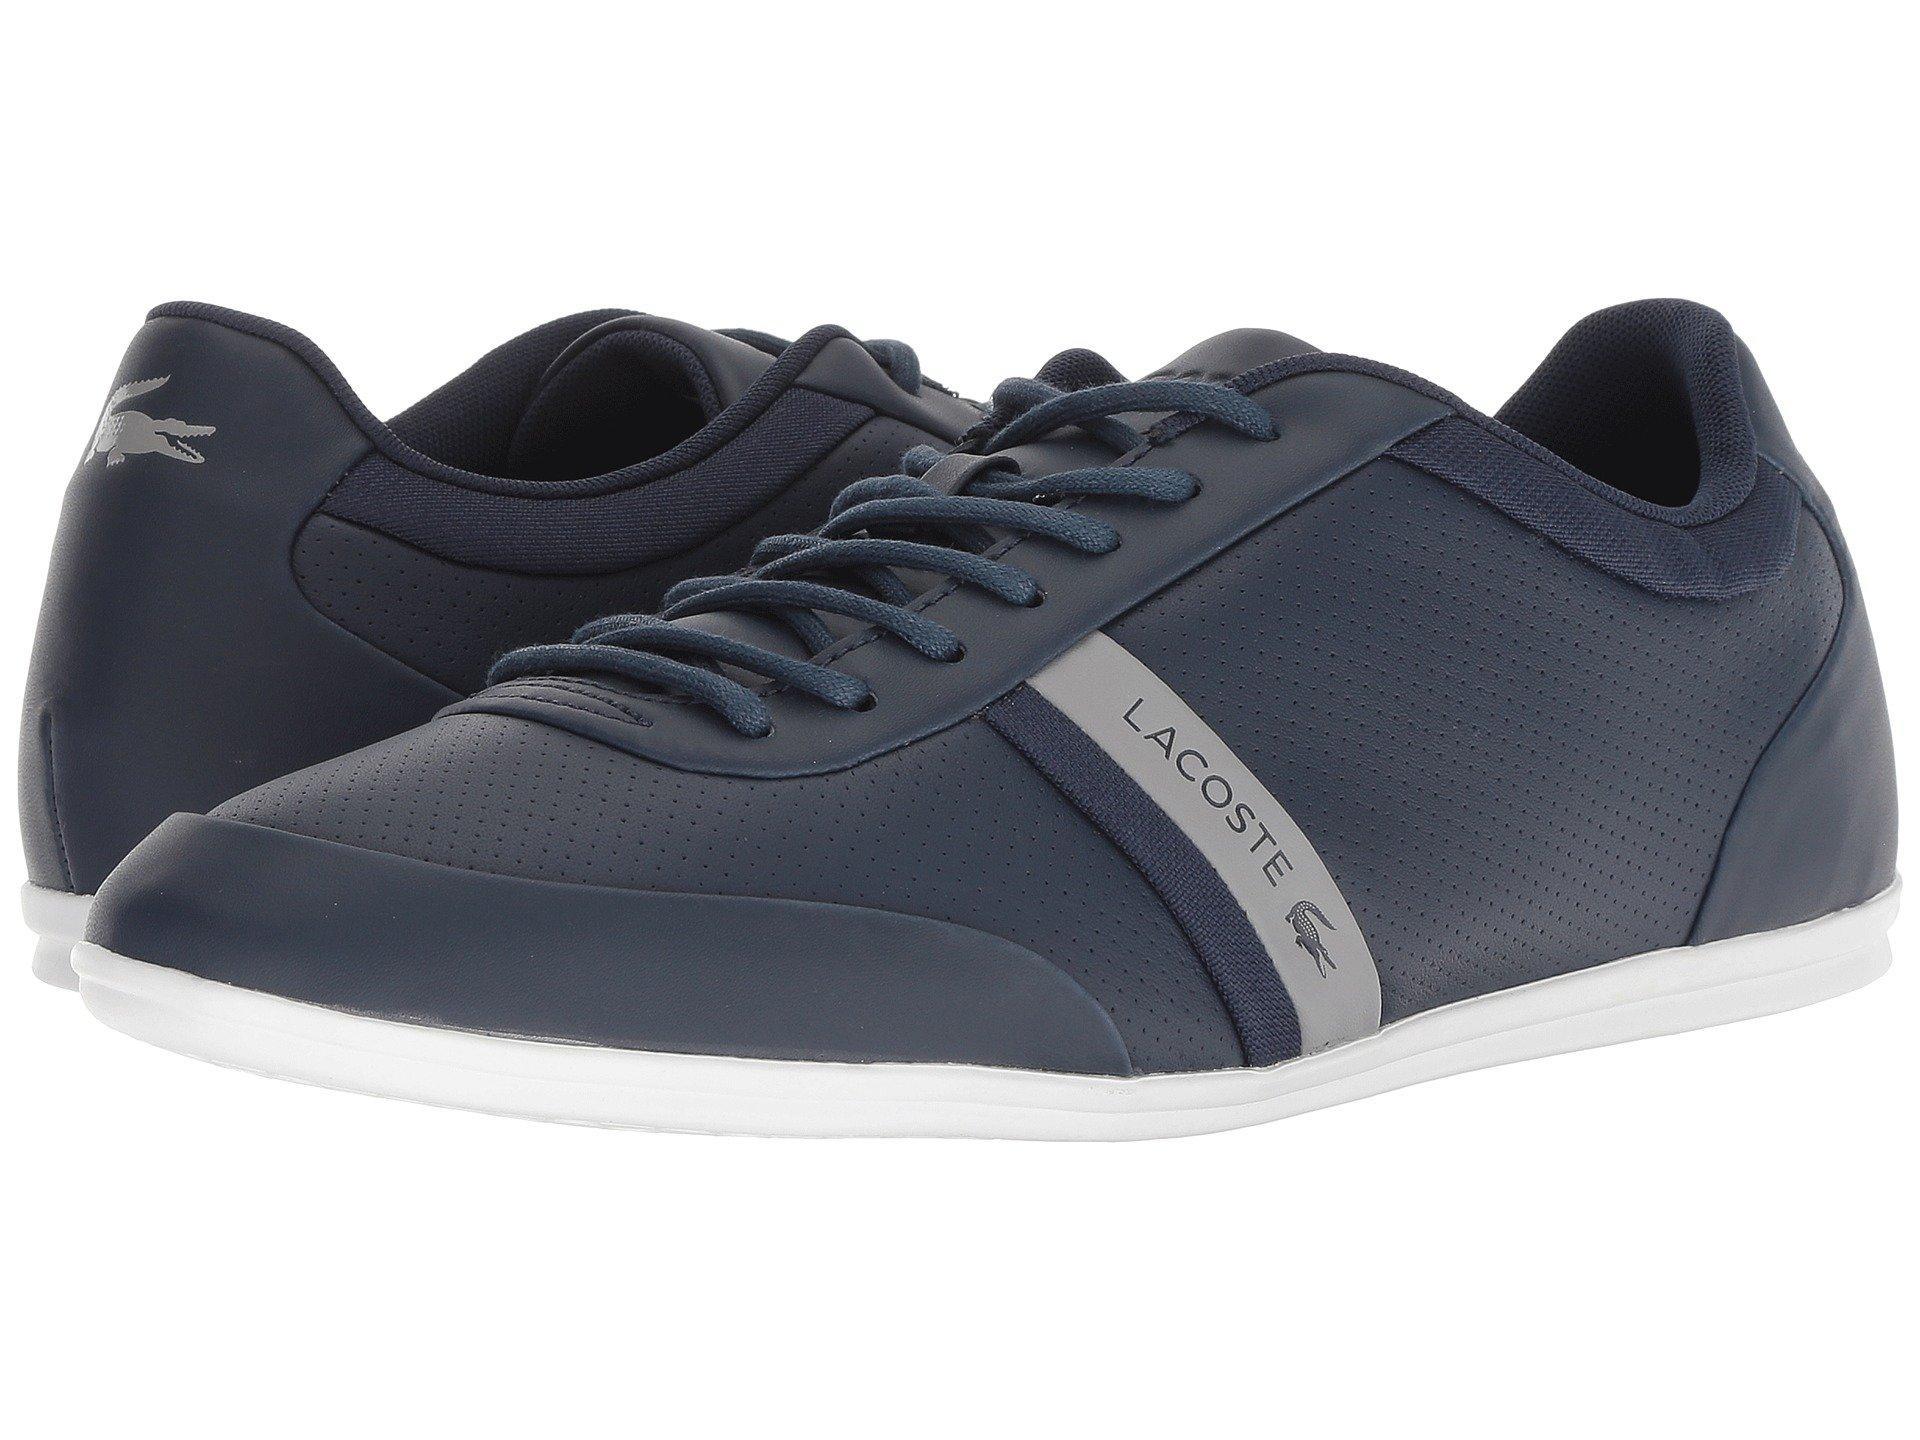 Lacoste Leather Storda 318 1 U in Gray